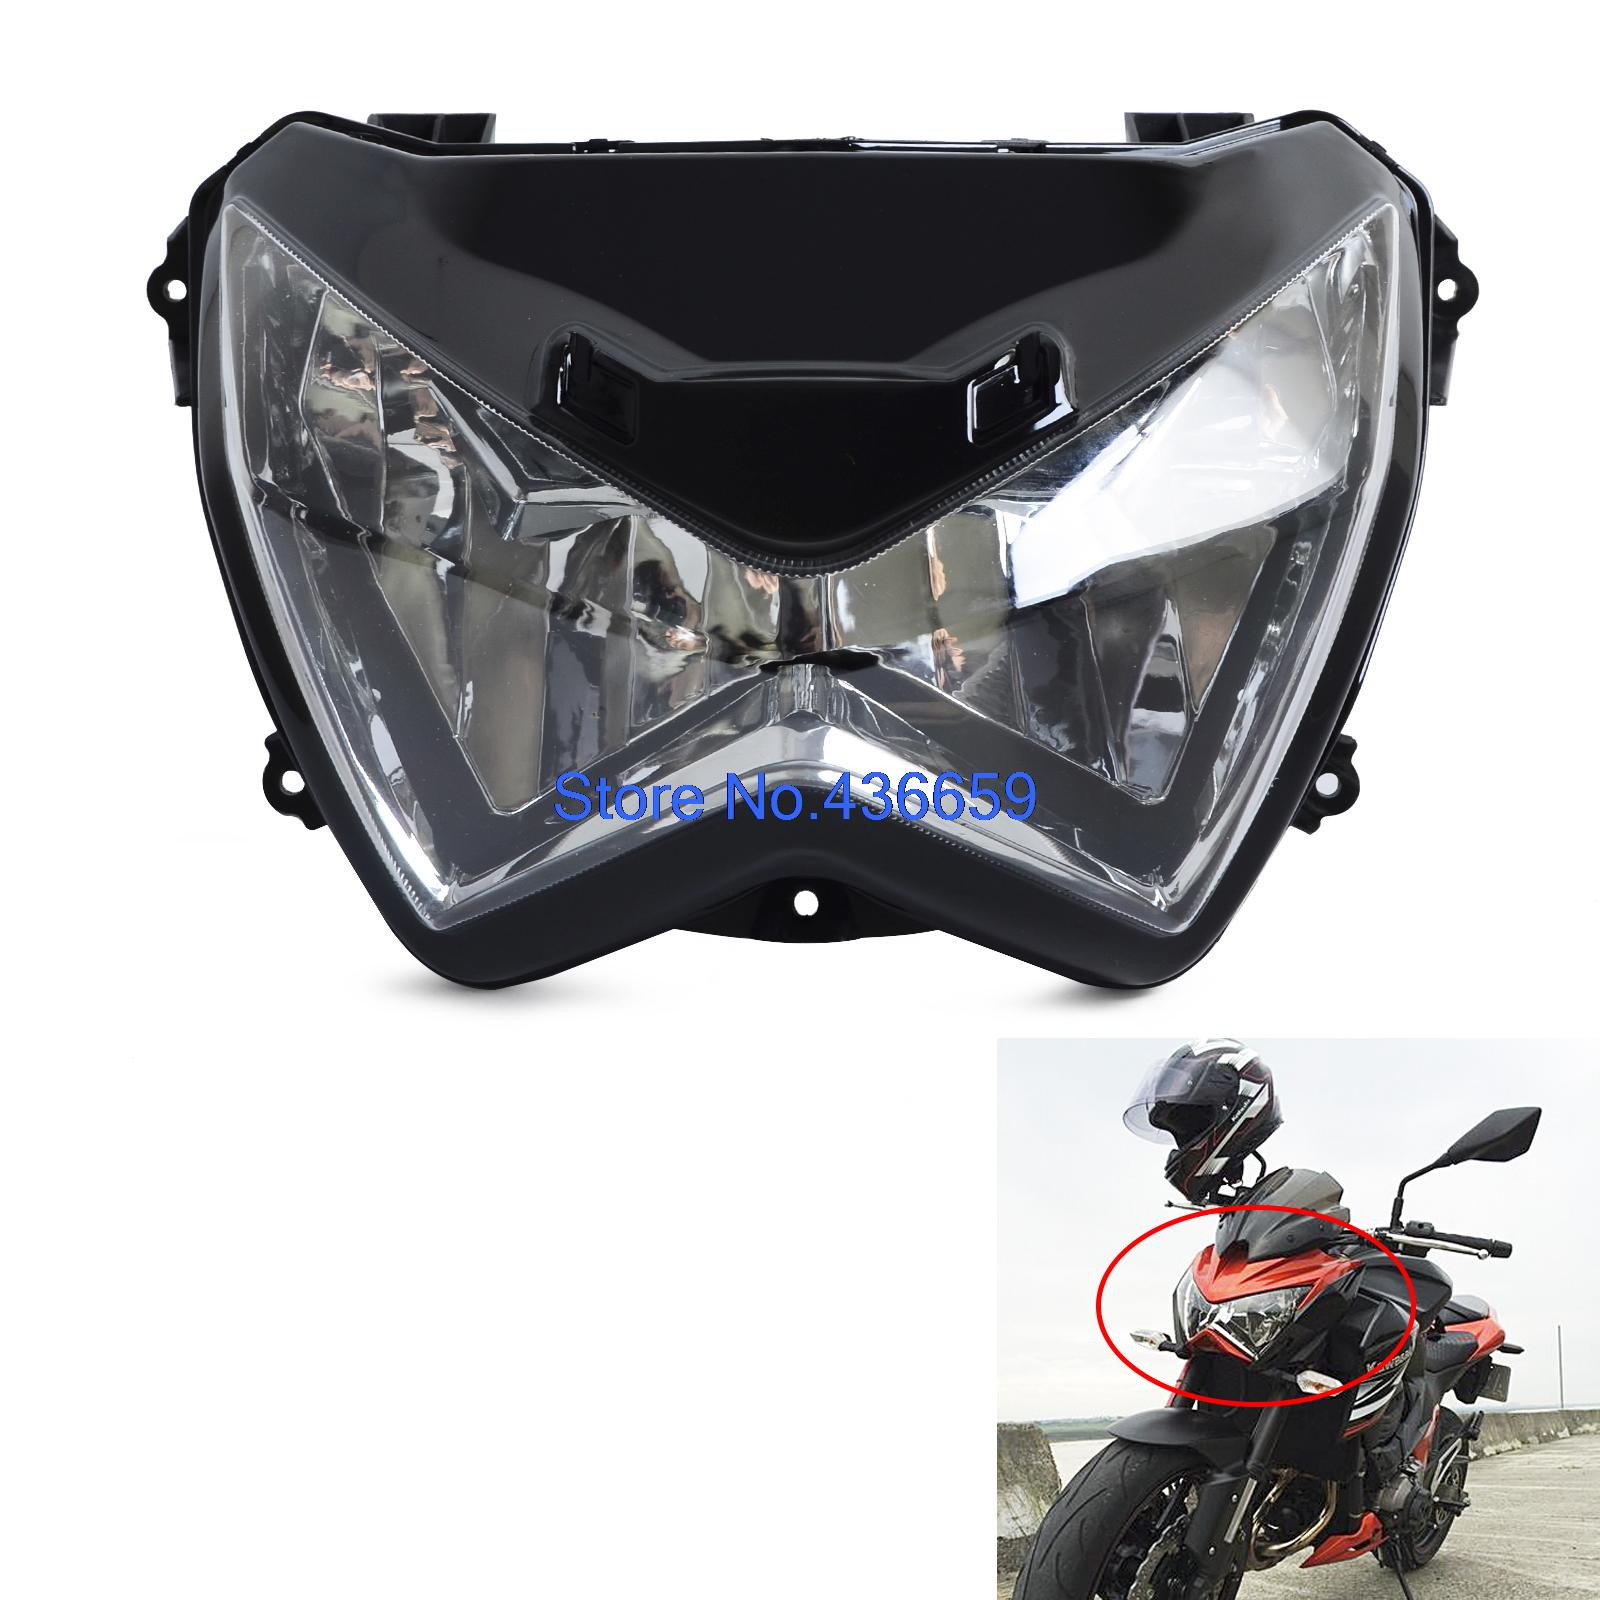 New Clear Headlight Front Head light Lamp For Kawasaki Z250 Z800 2013 2014 2015 2016 Z300 2015-2016